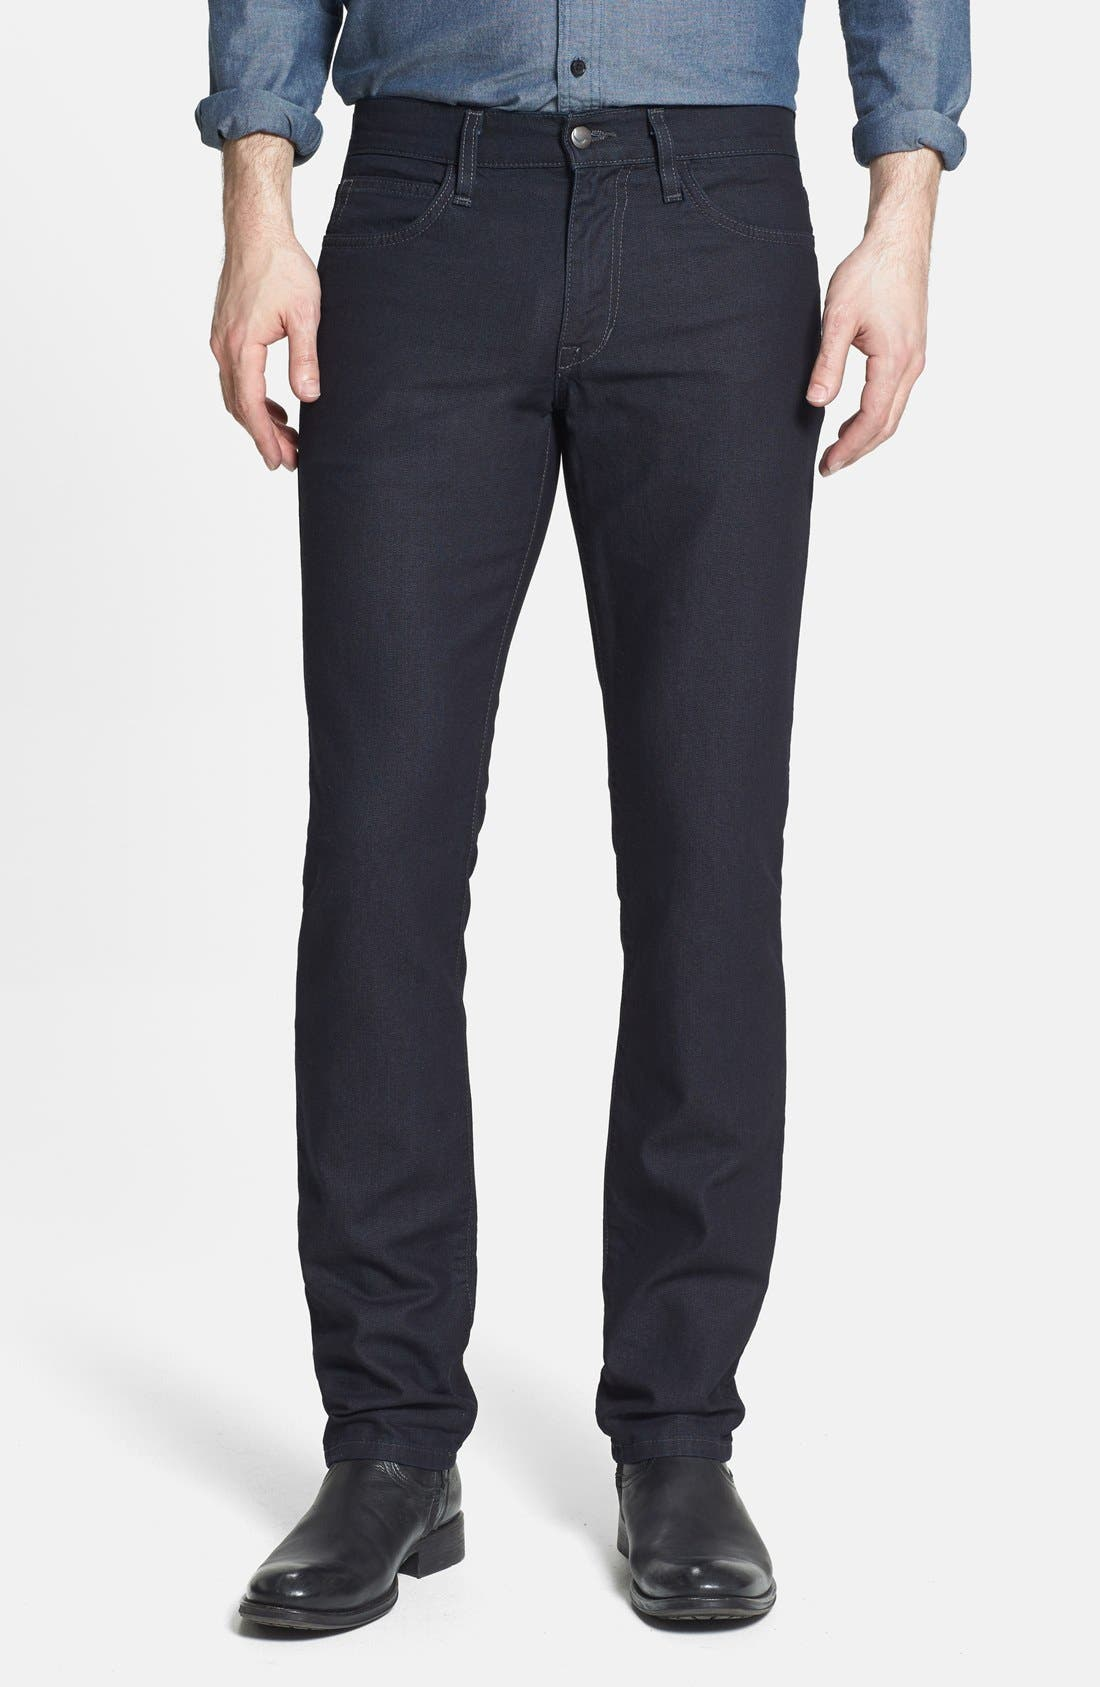 Alternate Image 1 Selected - Joe's 'Slim' Skinny Fit Jeans (Deandre)